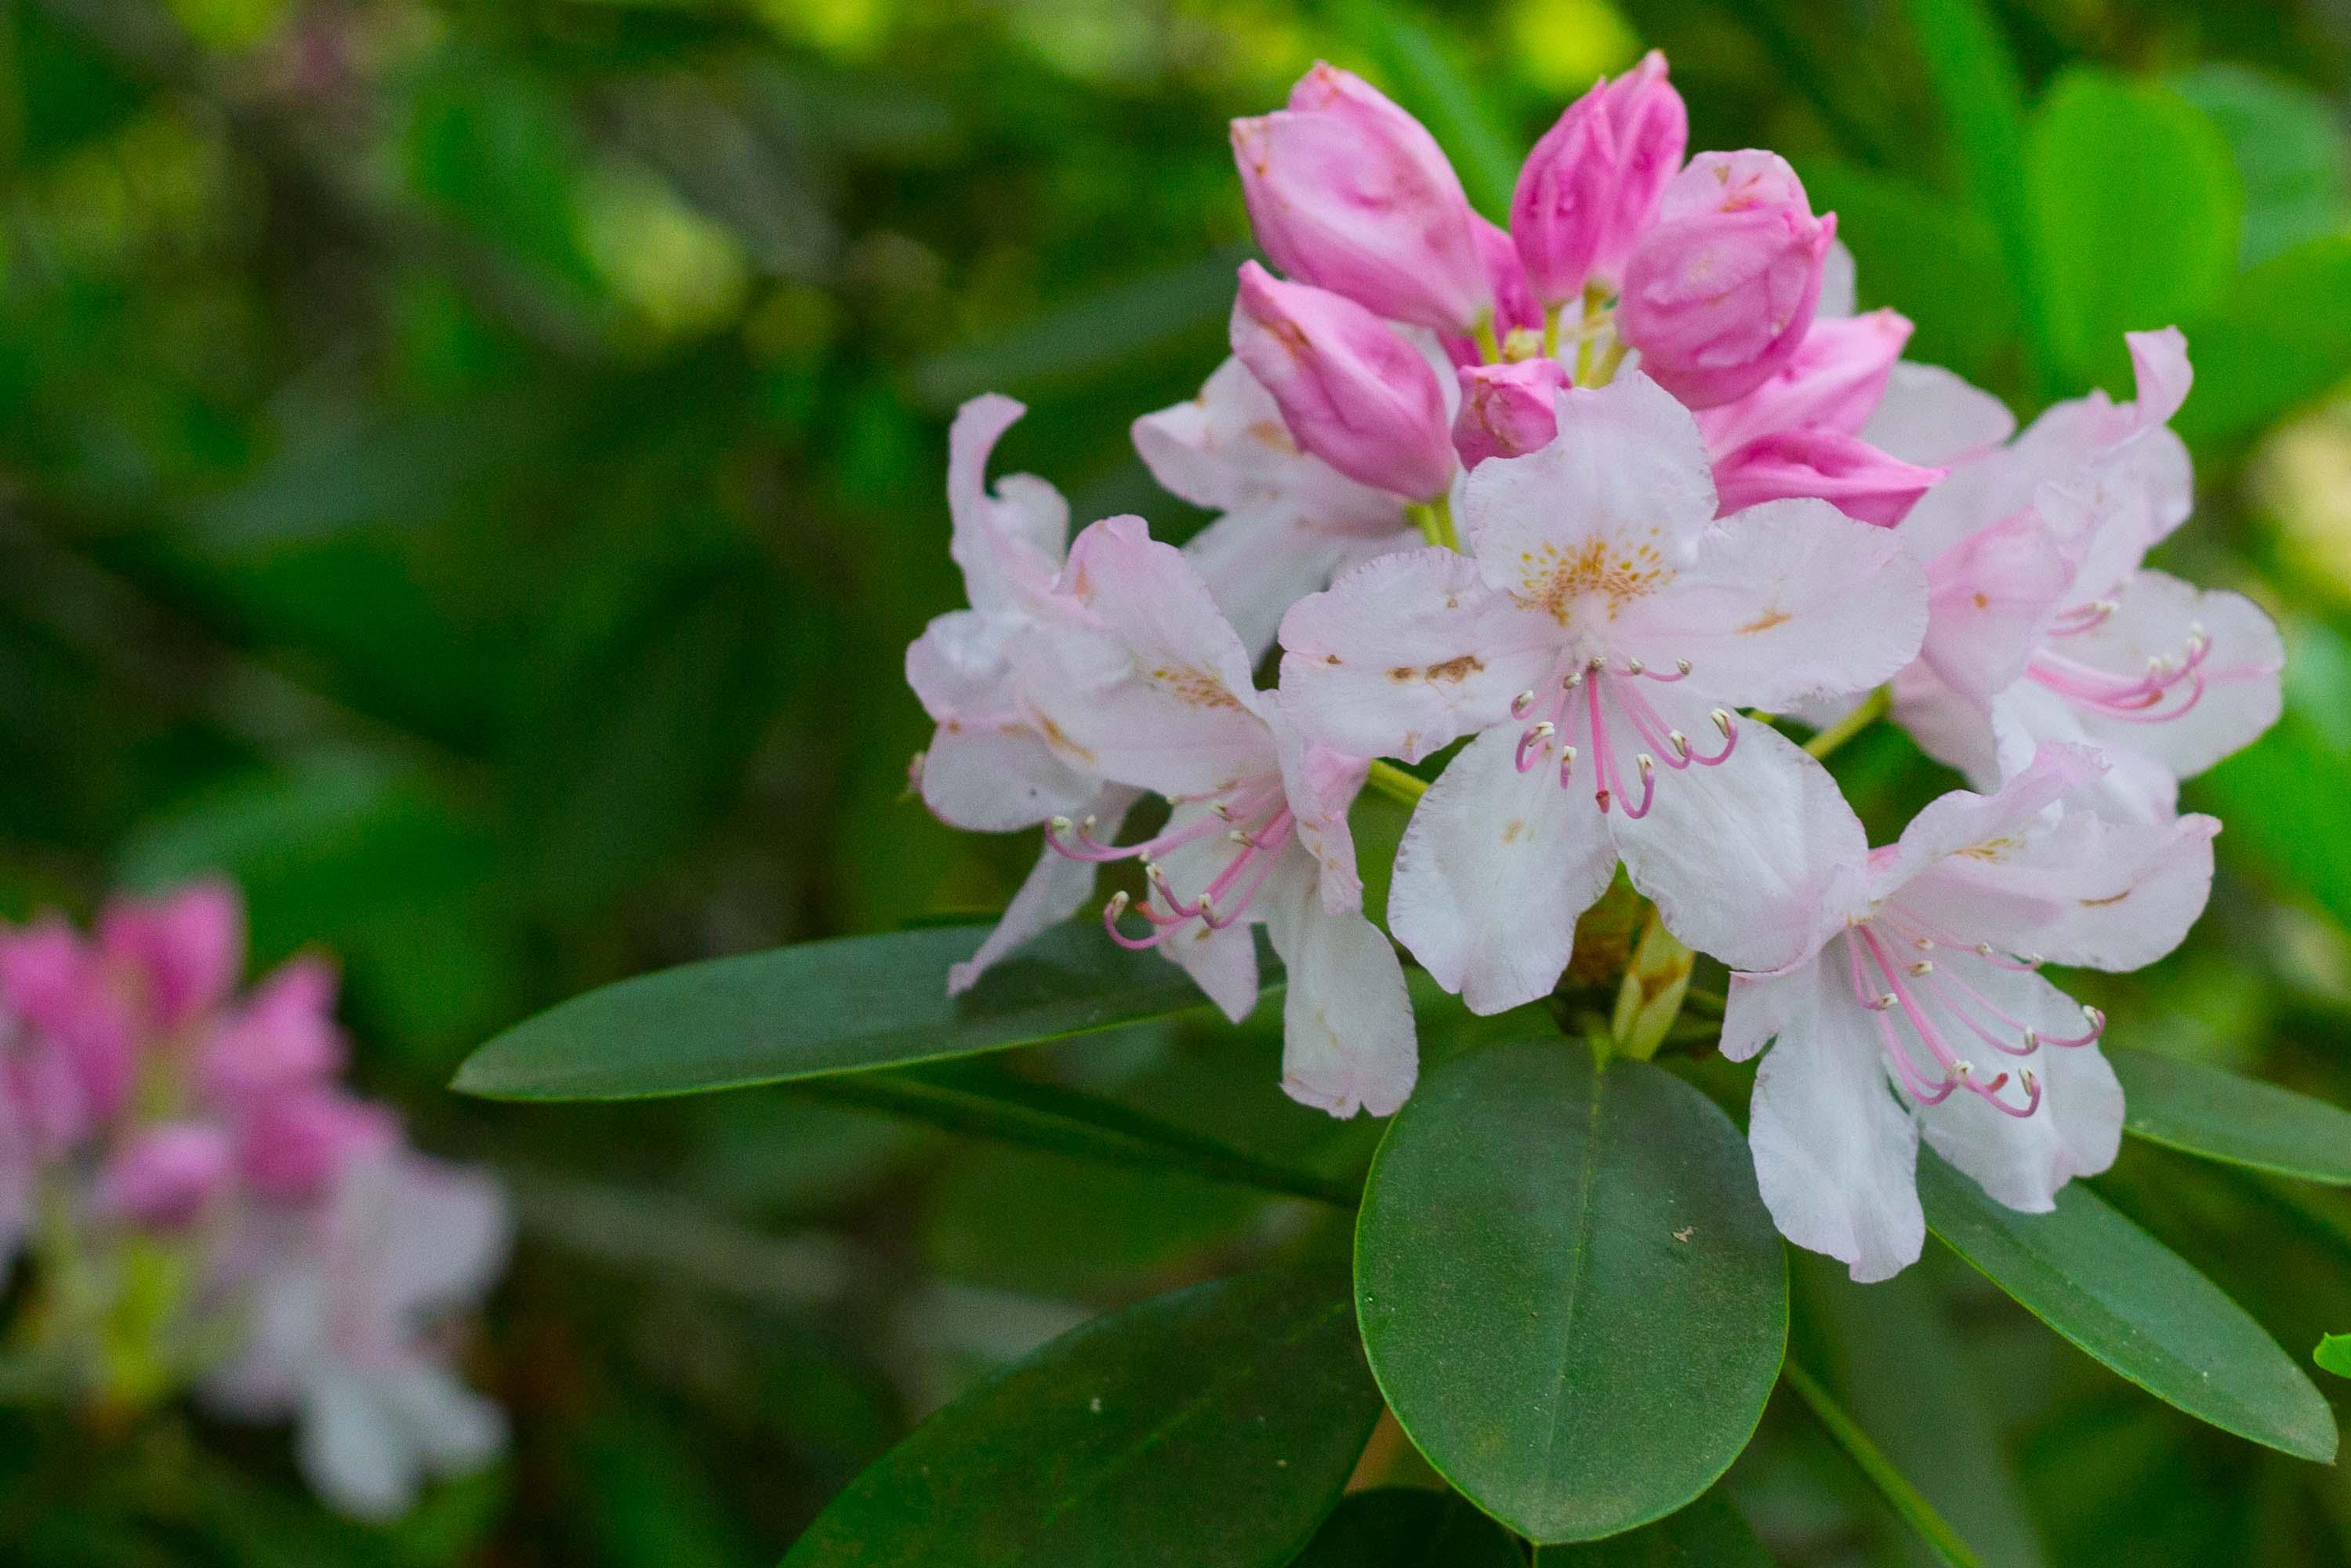 rododendrony-azalky-2013-arboretum-zv-13